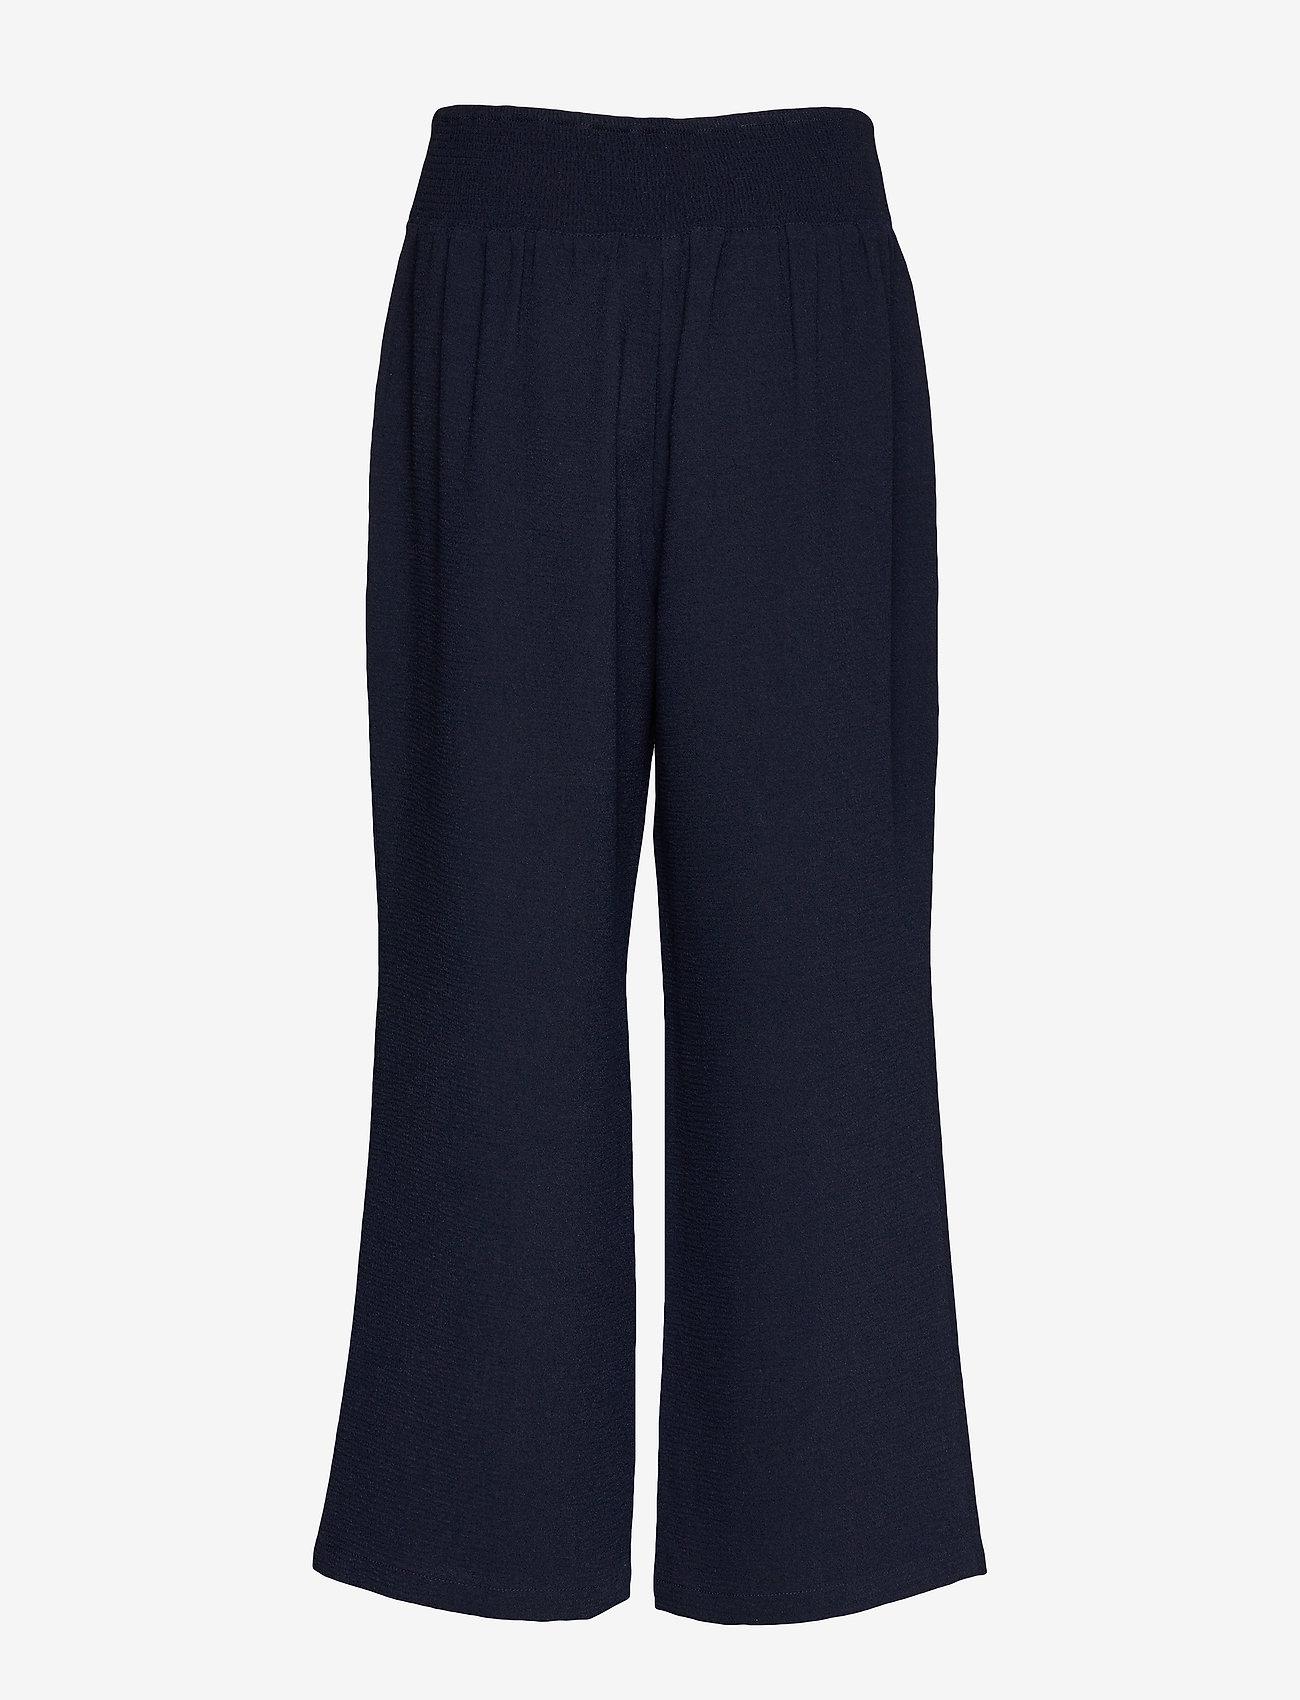 Pasine Trousers (Navy) - Masai NGmMfd